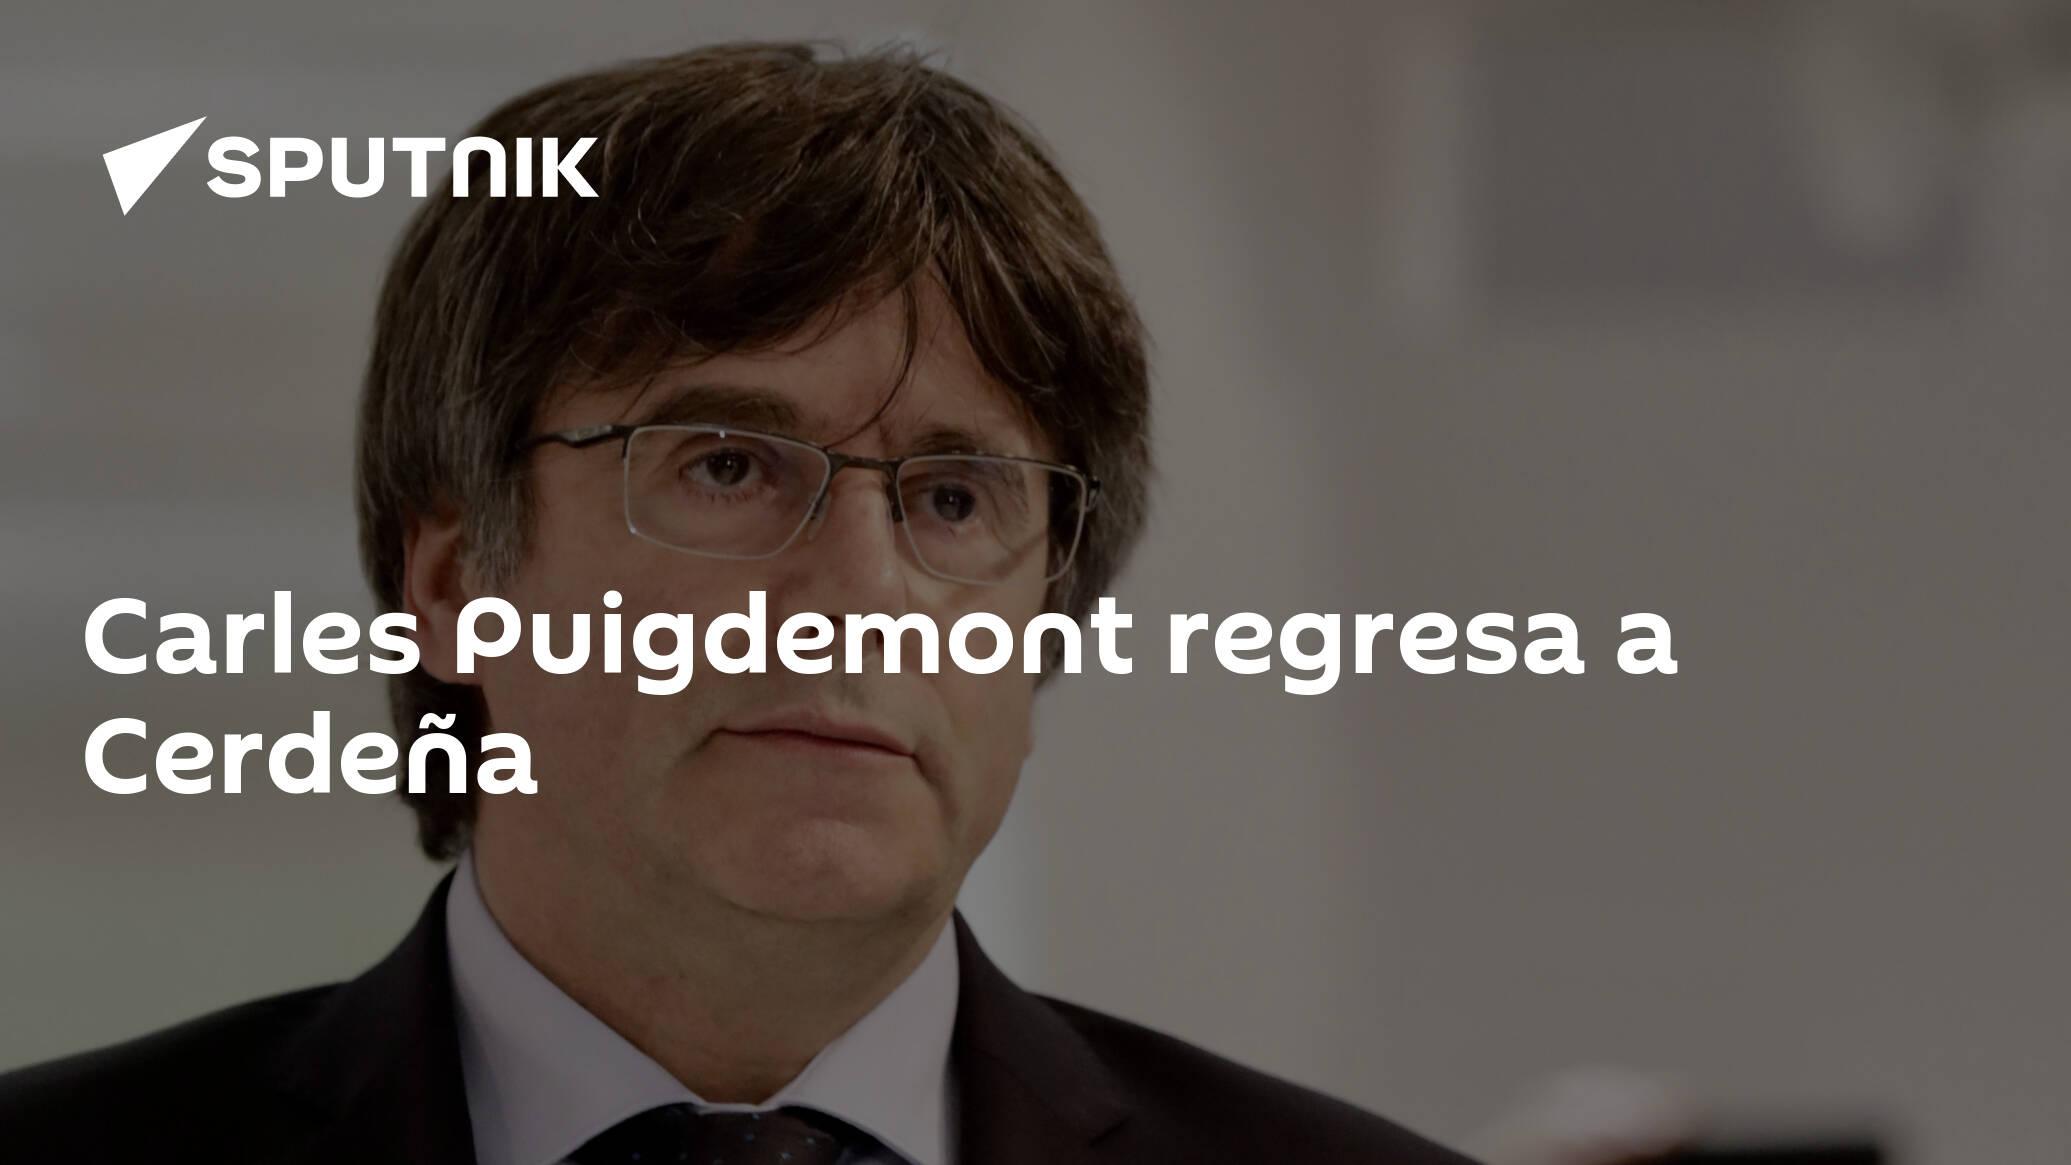 Carles Puigdemont regresa a Cerdeña